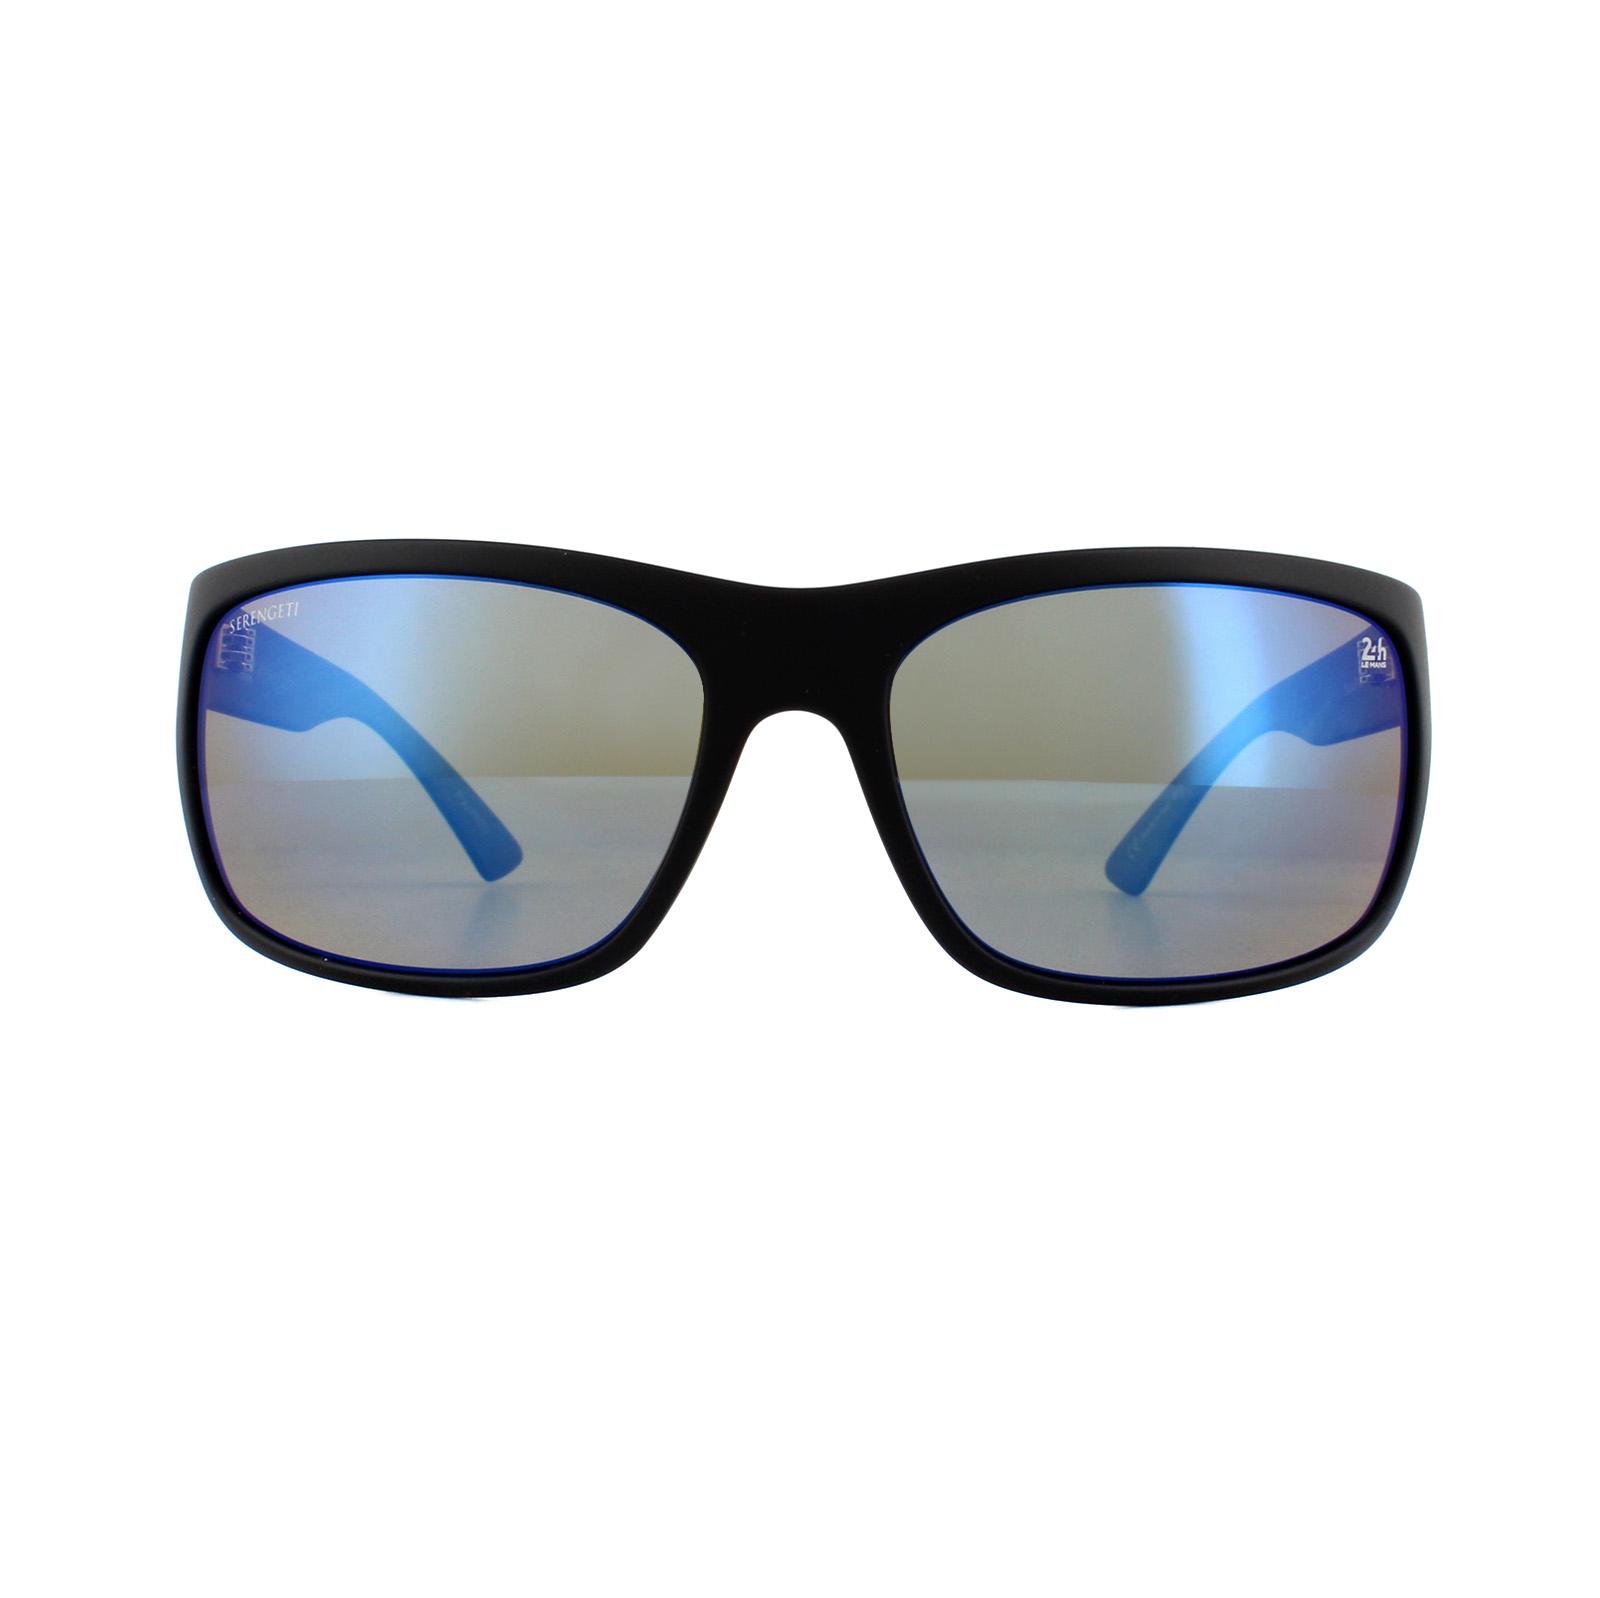 d2b1b78313 Sentinel Serengeti Sunglasses Pistoia 8743 Satin Black Dark Blue 555nm Blue  Polarized. Sentinel Thumbnail 2